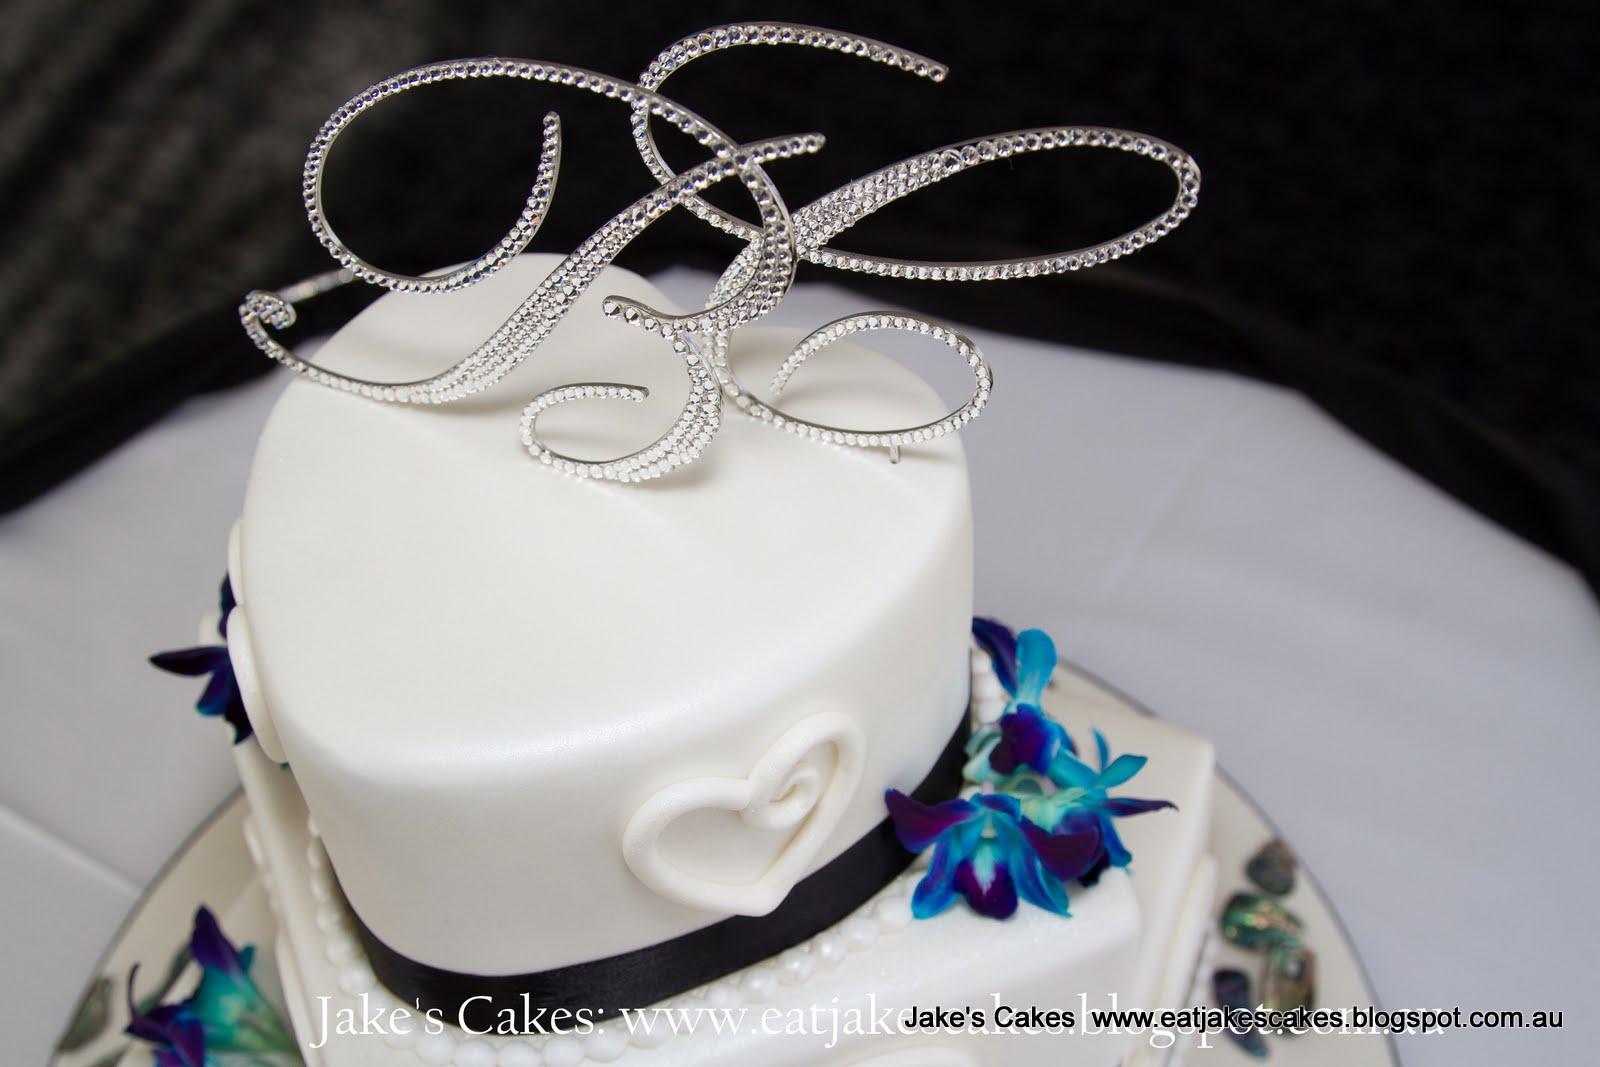 Jakes cakes june 2013 new zealand inspired koru symbol wedding cake biocorpaavc Image collections